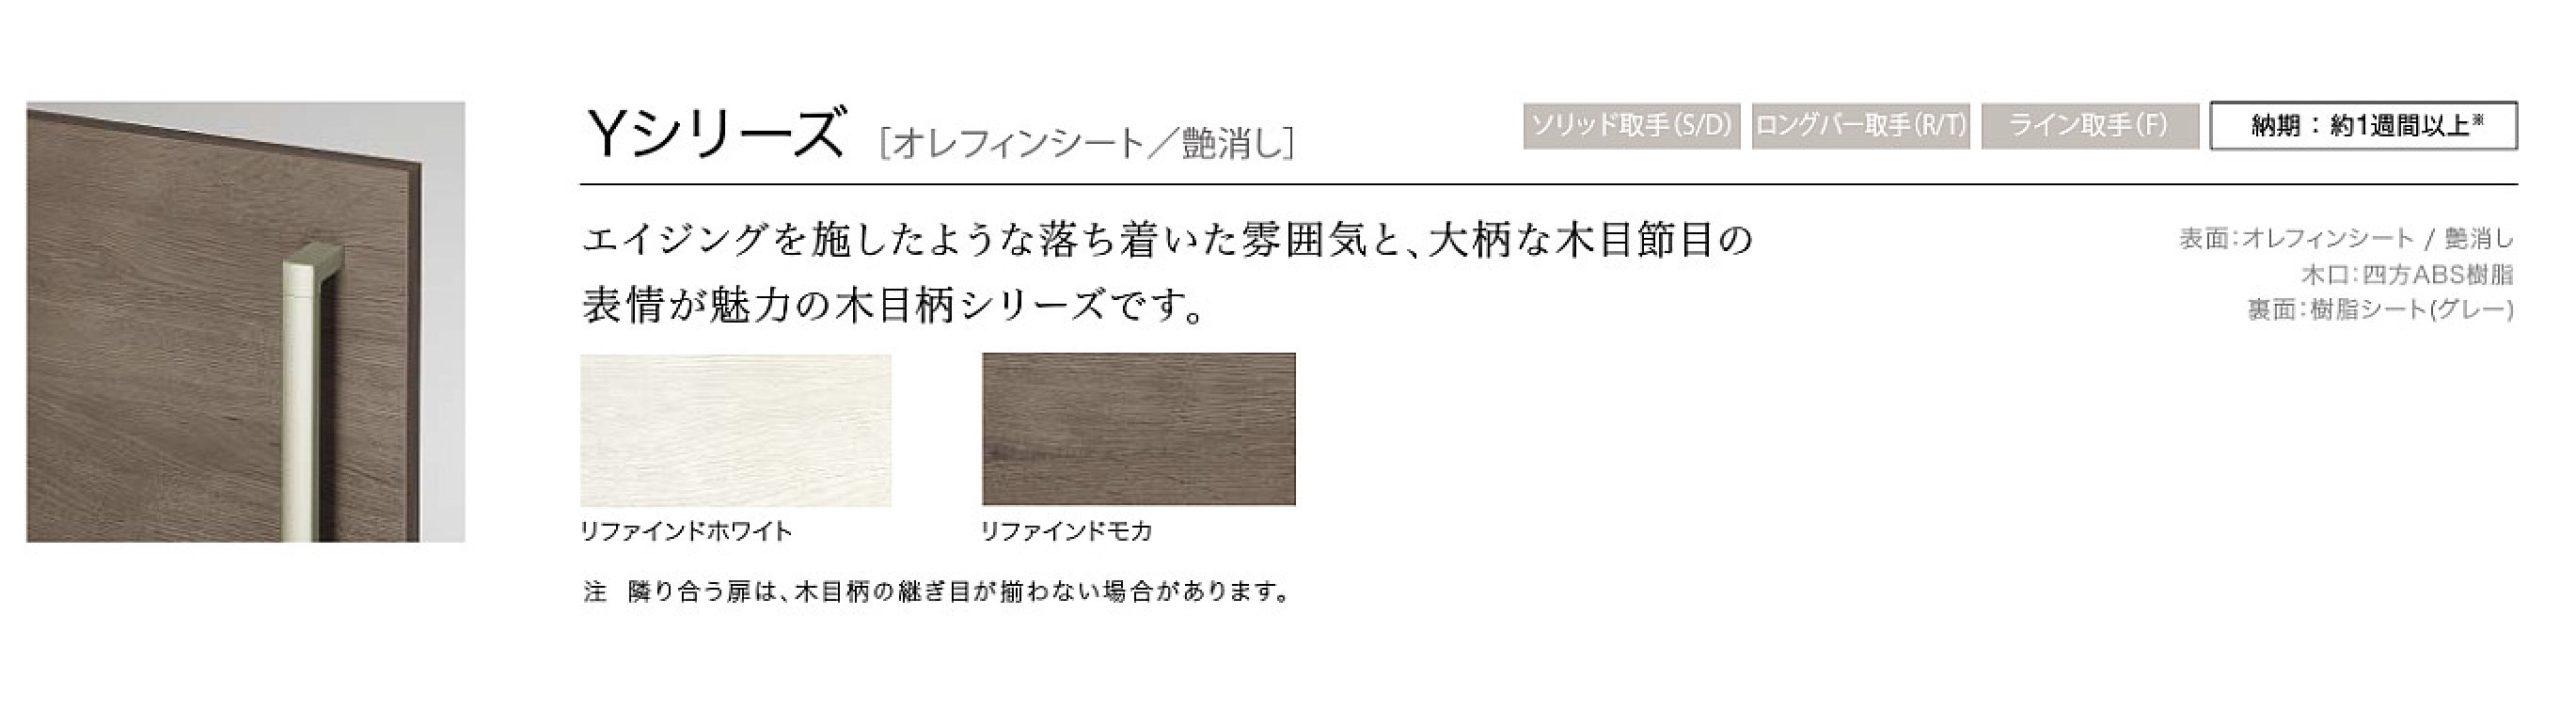 Yシリーズ/リファインホワイト・リファインモカ